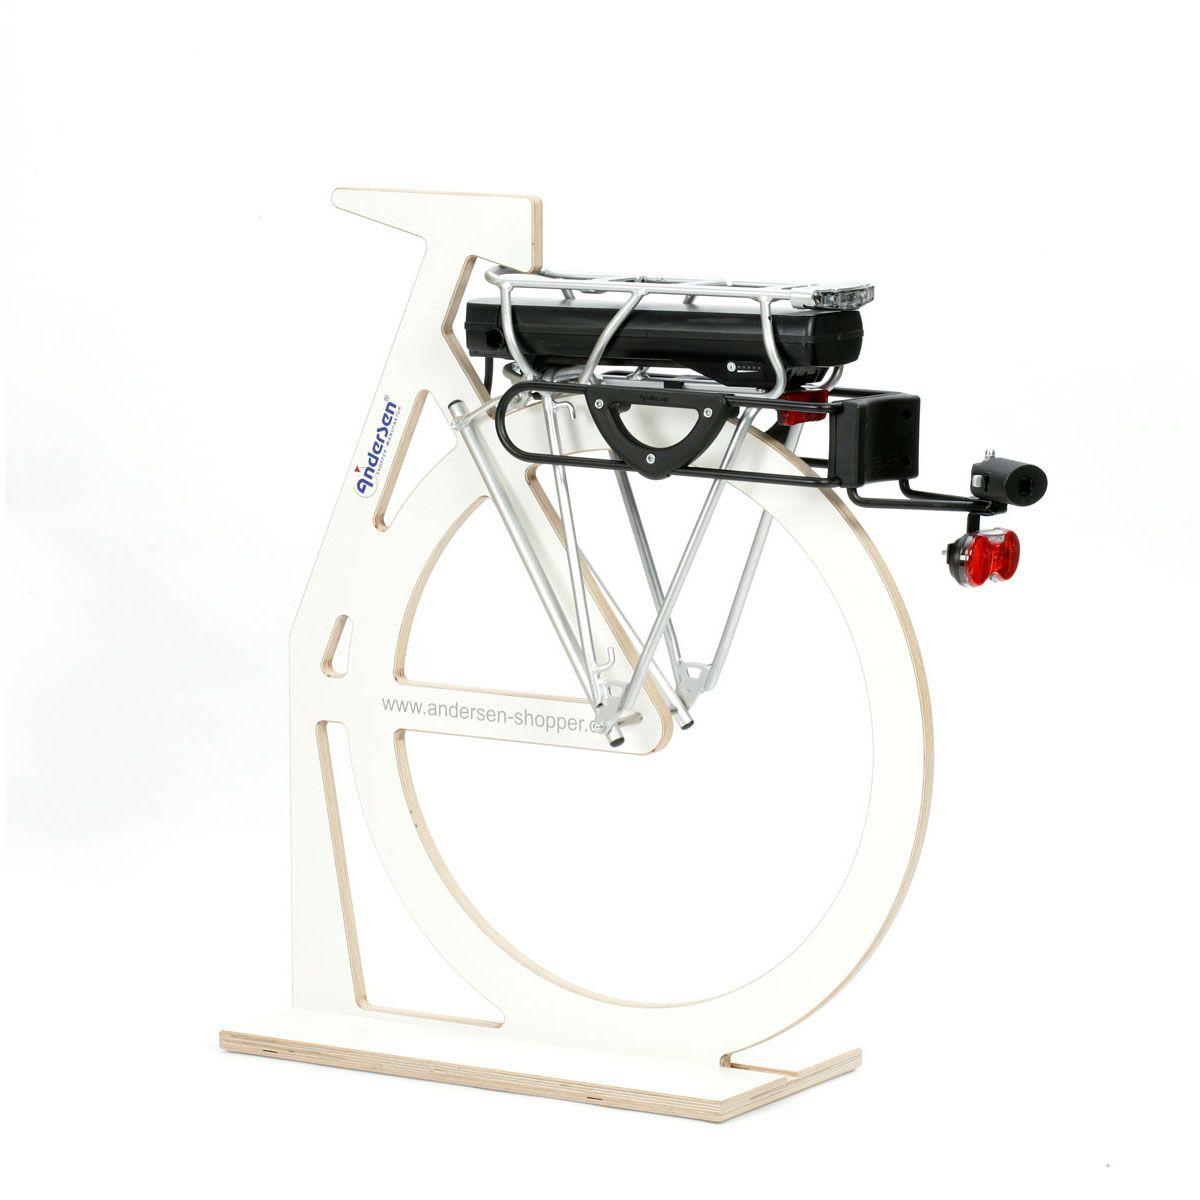 fahrrad kupplung pulleasy g1 6 415 80. Black Bedroom Furniture Sets. Home Design Ideas